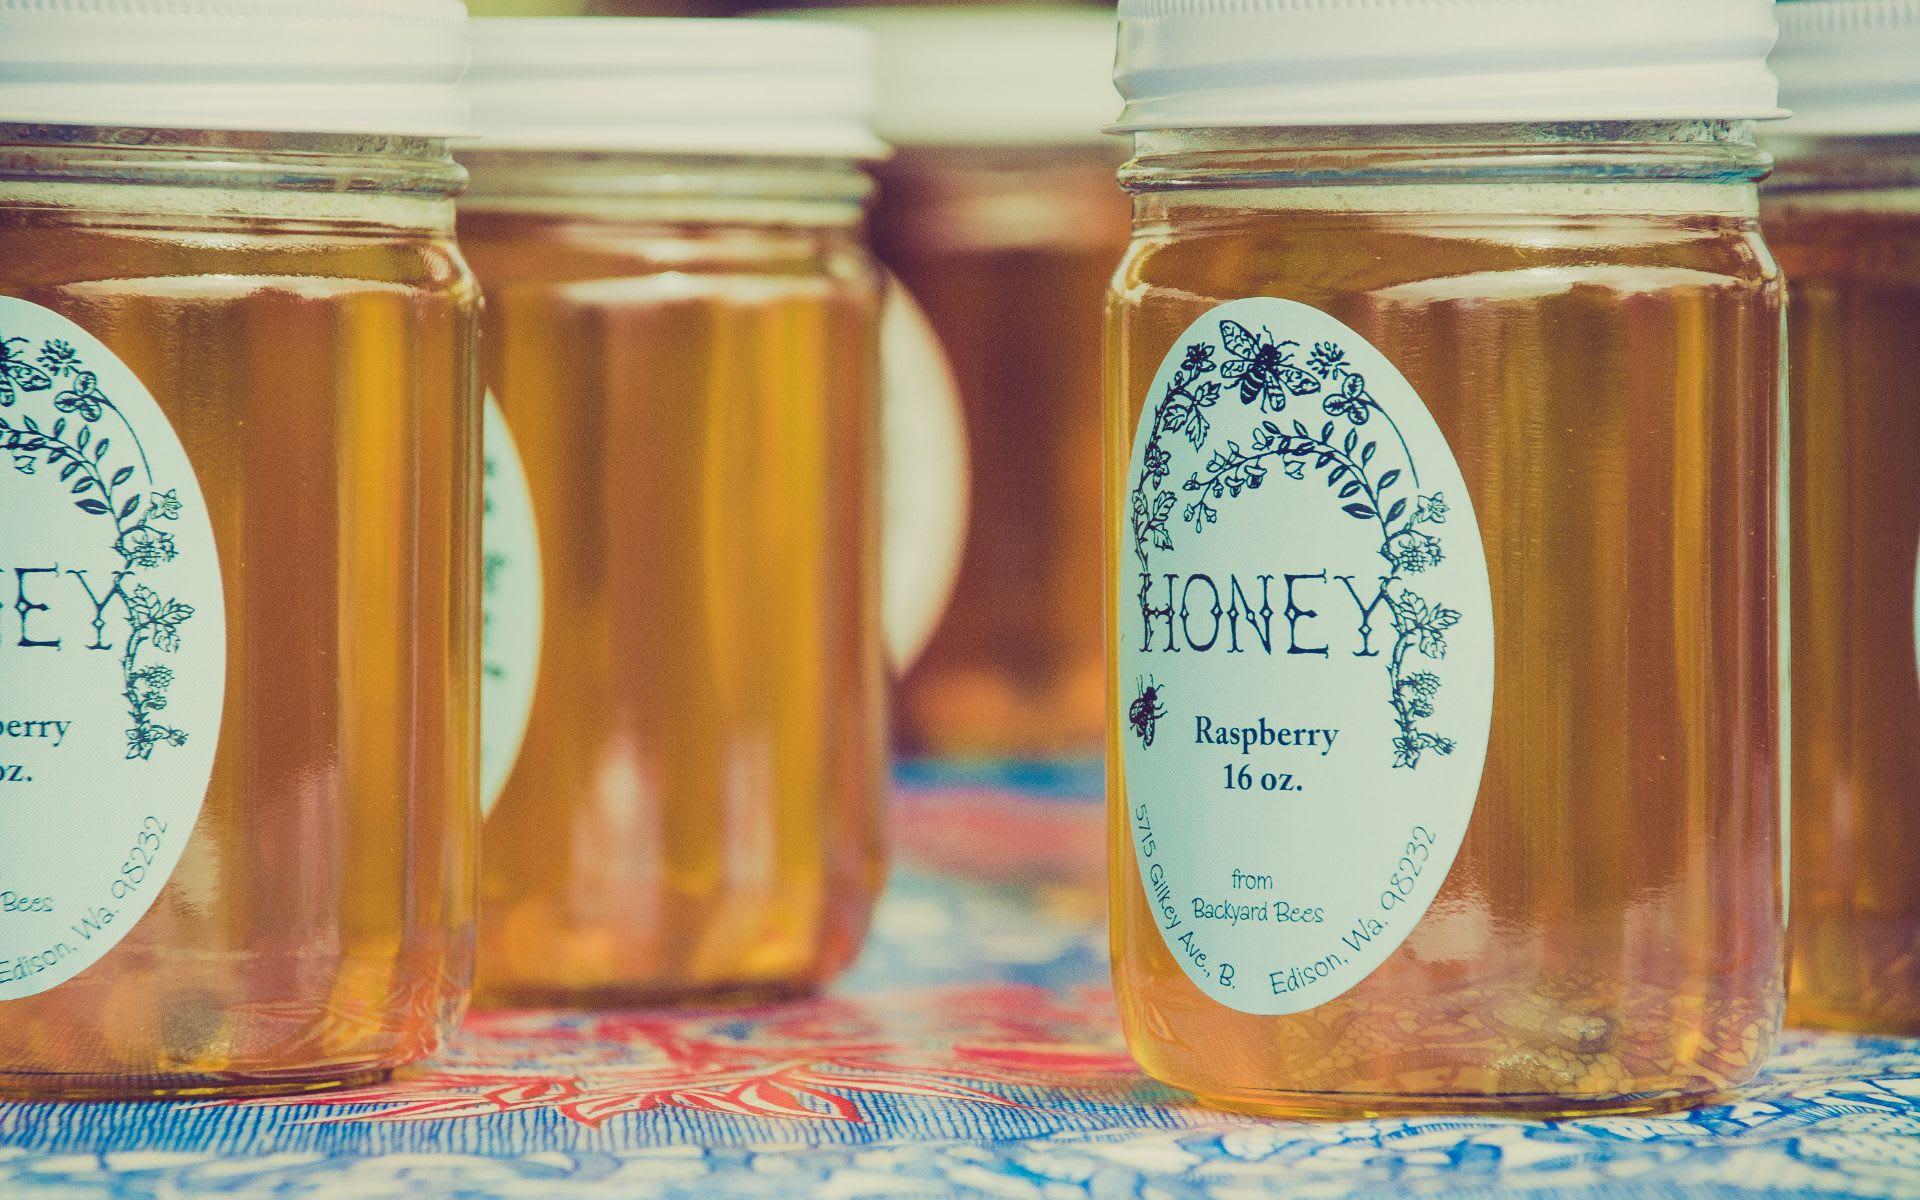 Milton Honey Stands